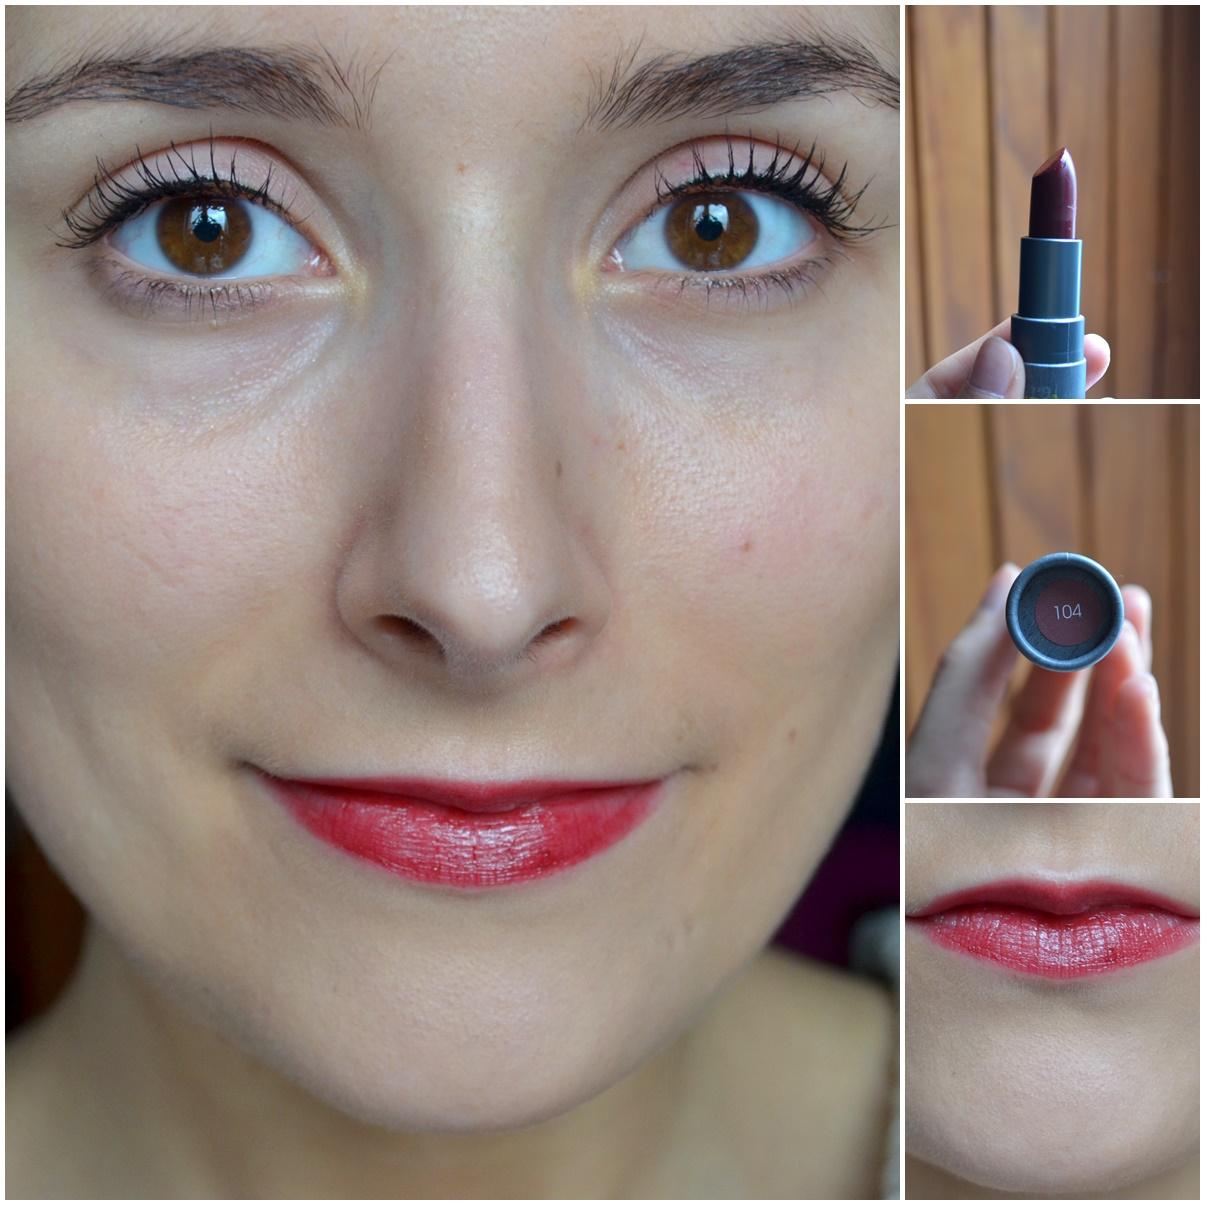 maquillage boho cosmetics rouge à lèvres teinte 104